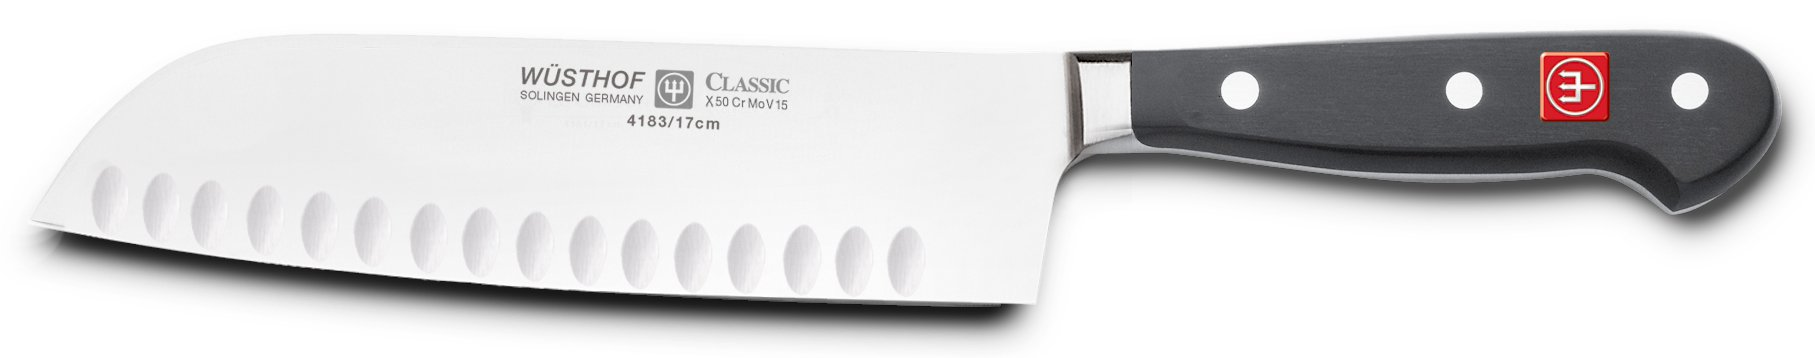 Wusthof Classic 7-inch Hollow Edge Santoku Knife